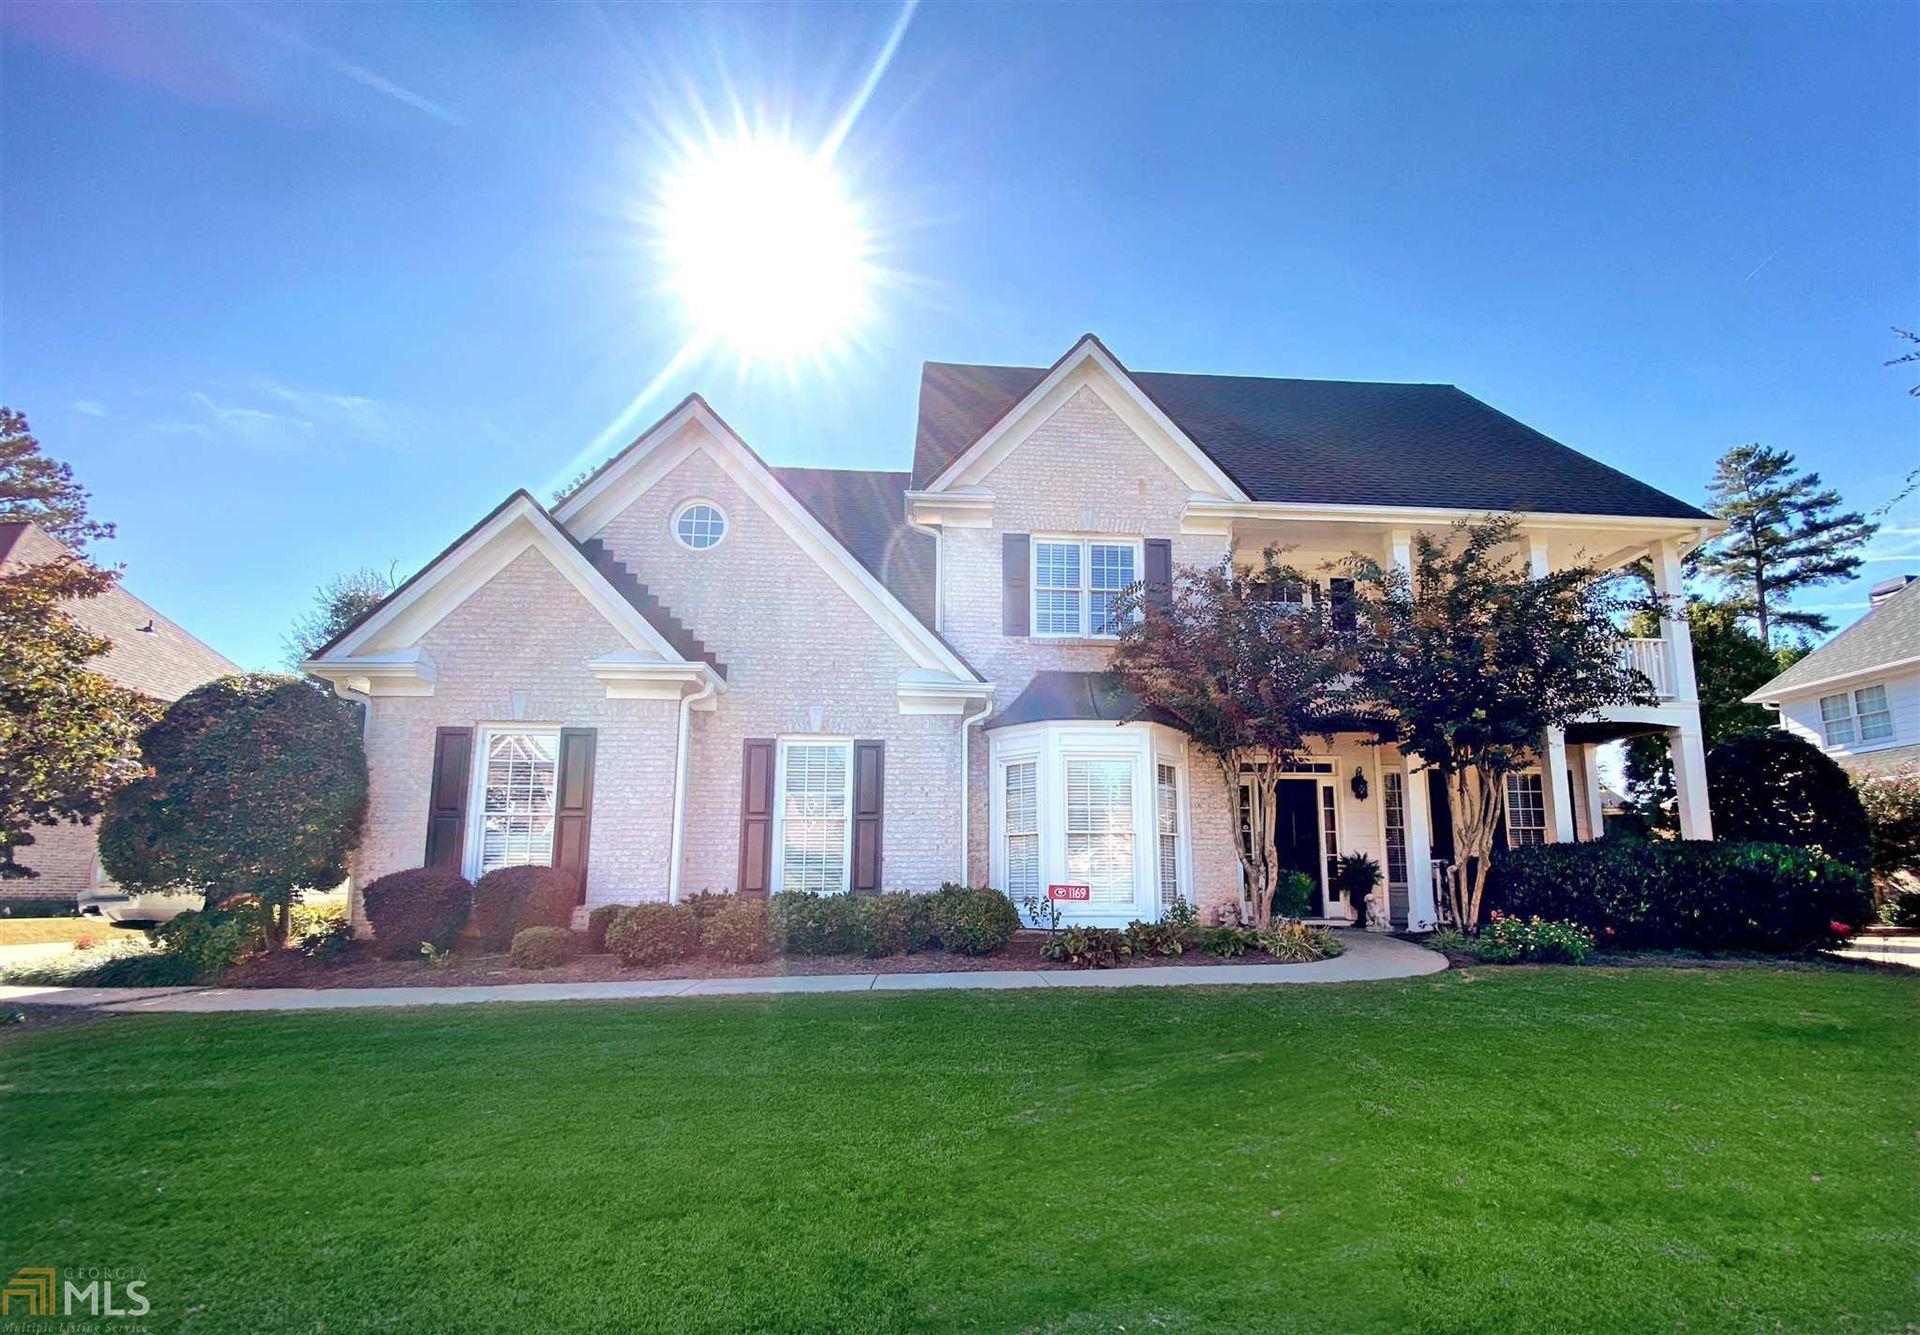 1169 Pughes Creek Way, Lawrenceville, GA 30045 - MLS#: 8870275